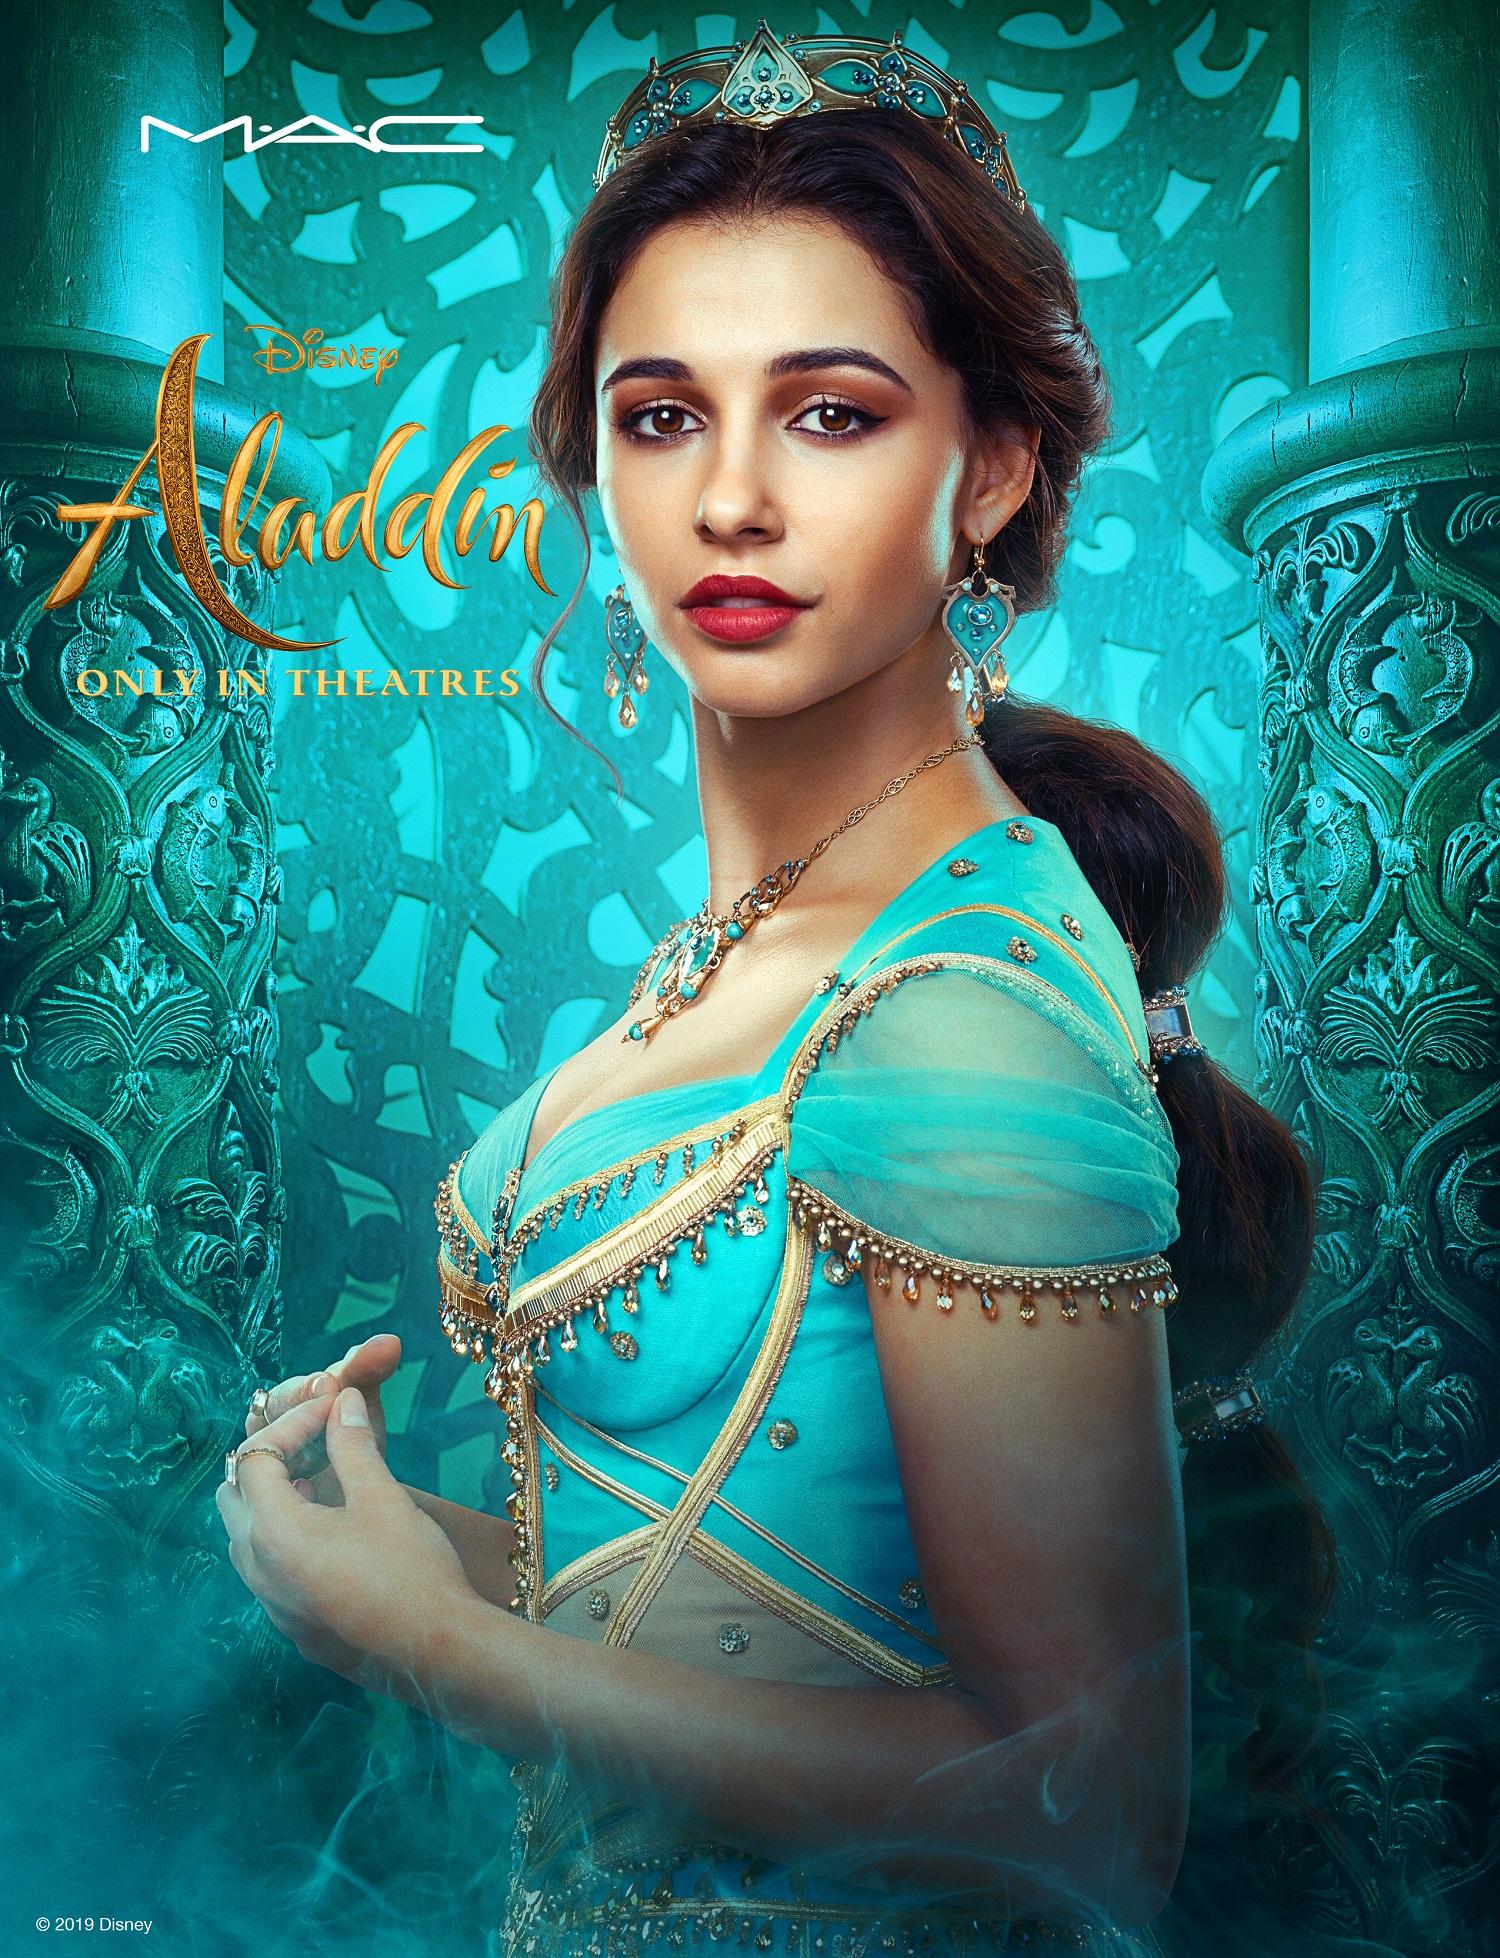 Aladdin film Disney, il make up dedicato